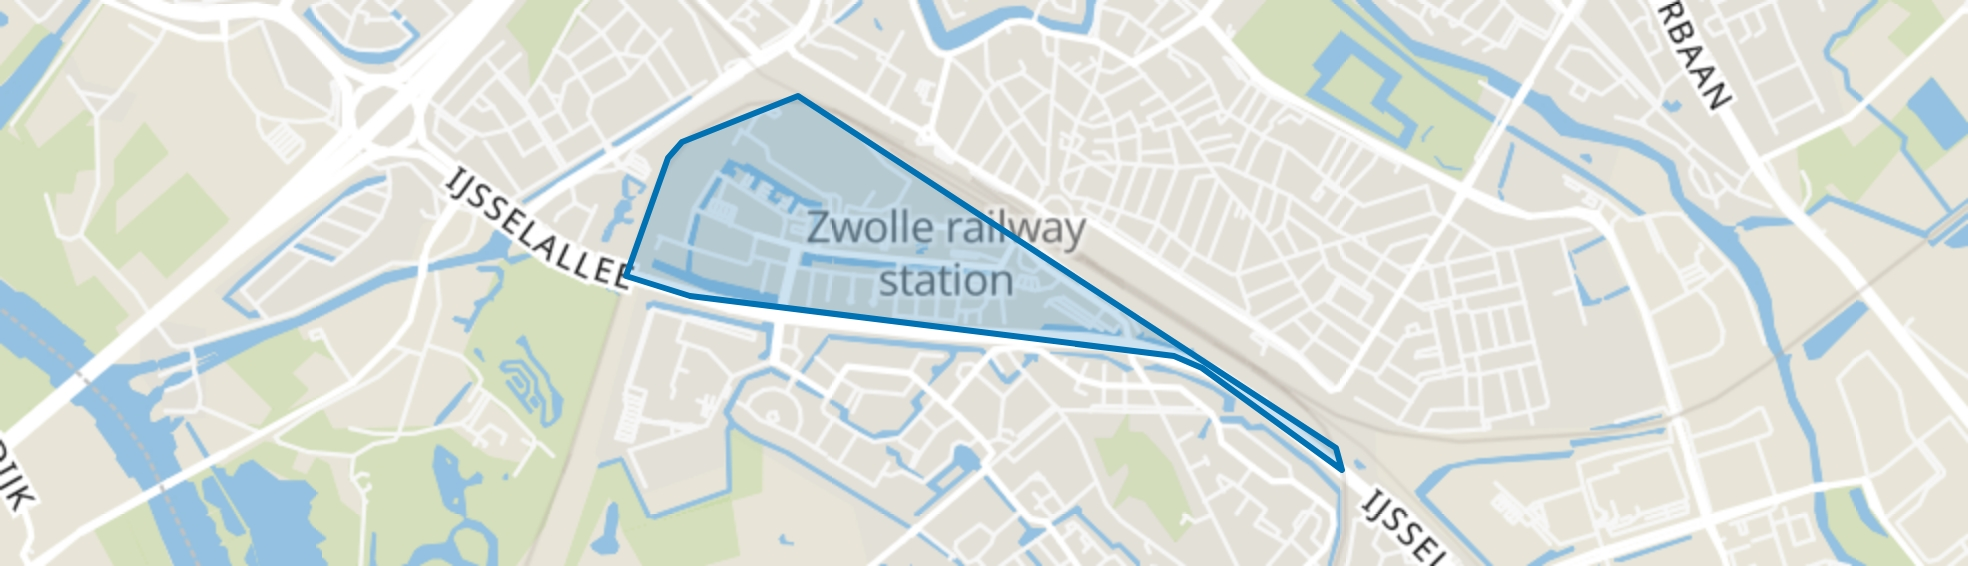 Hanzeland, Zwolle map